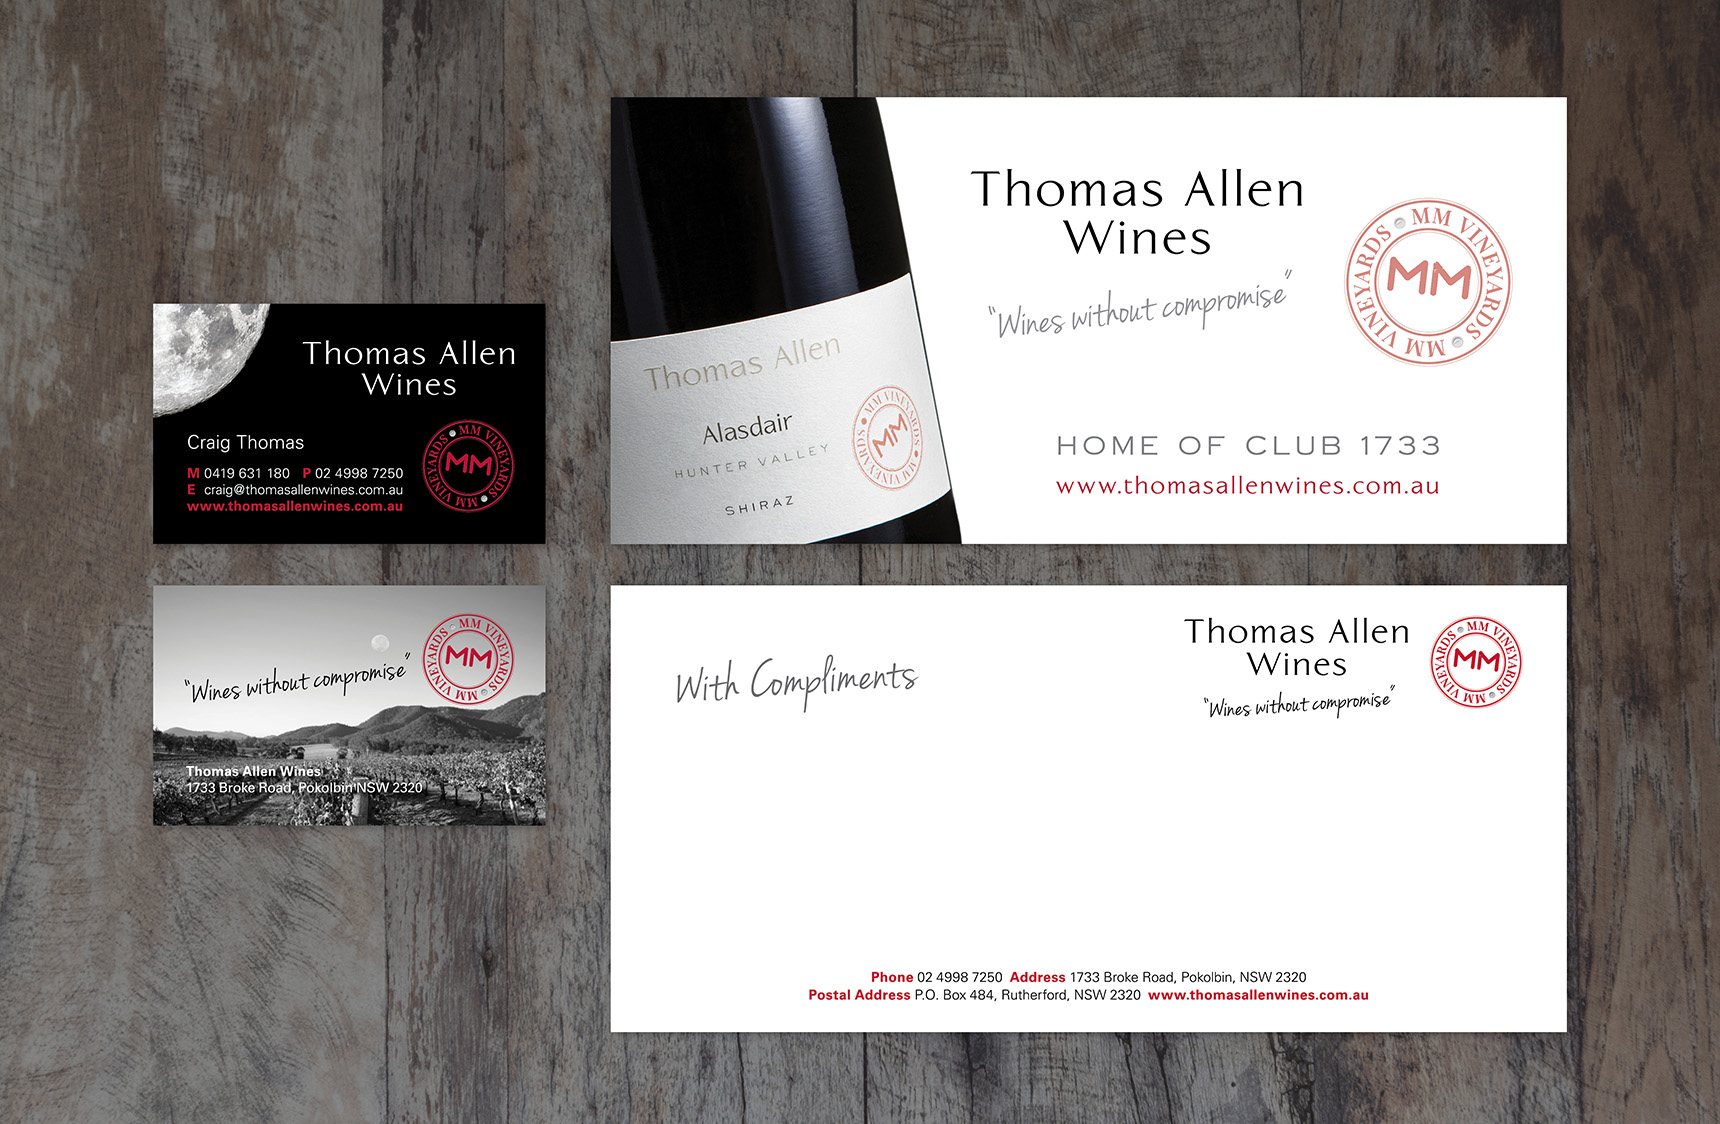 mjk_thomas-allen-wines_01